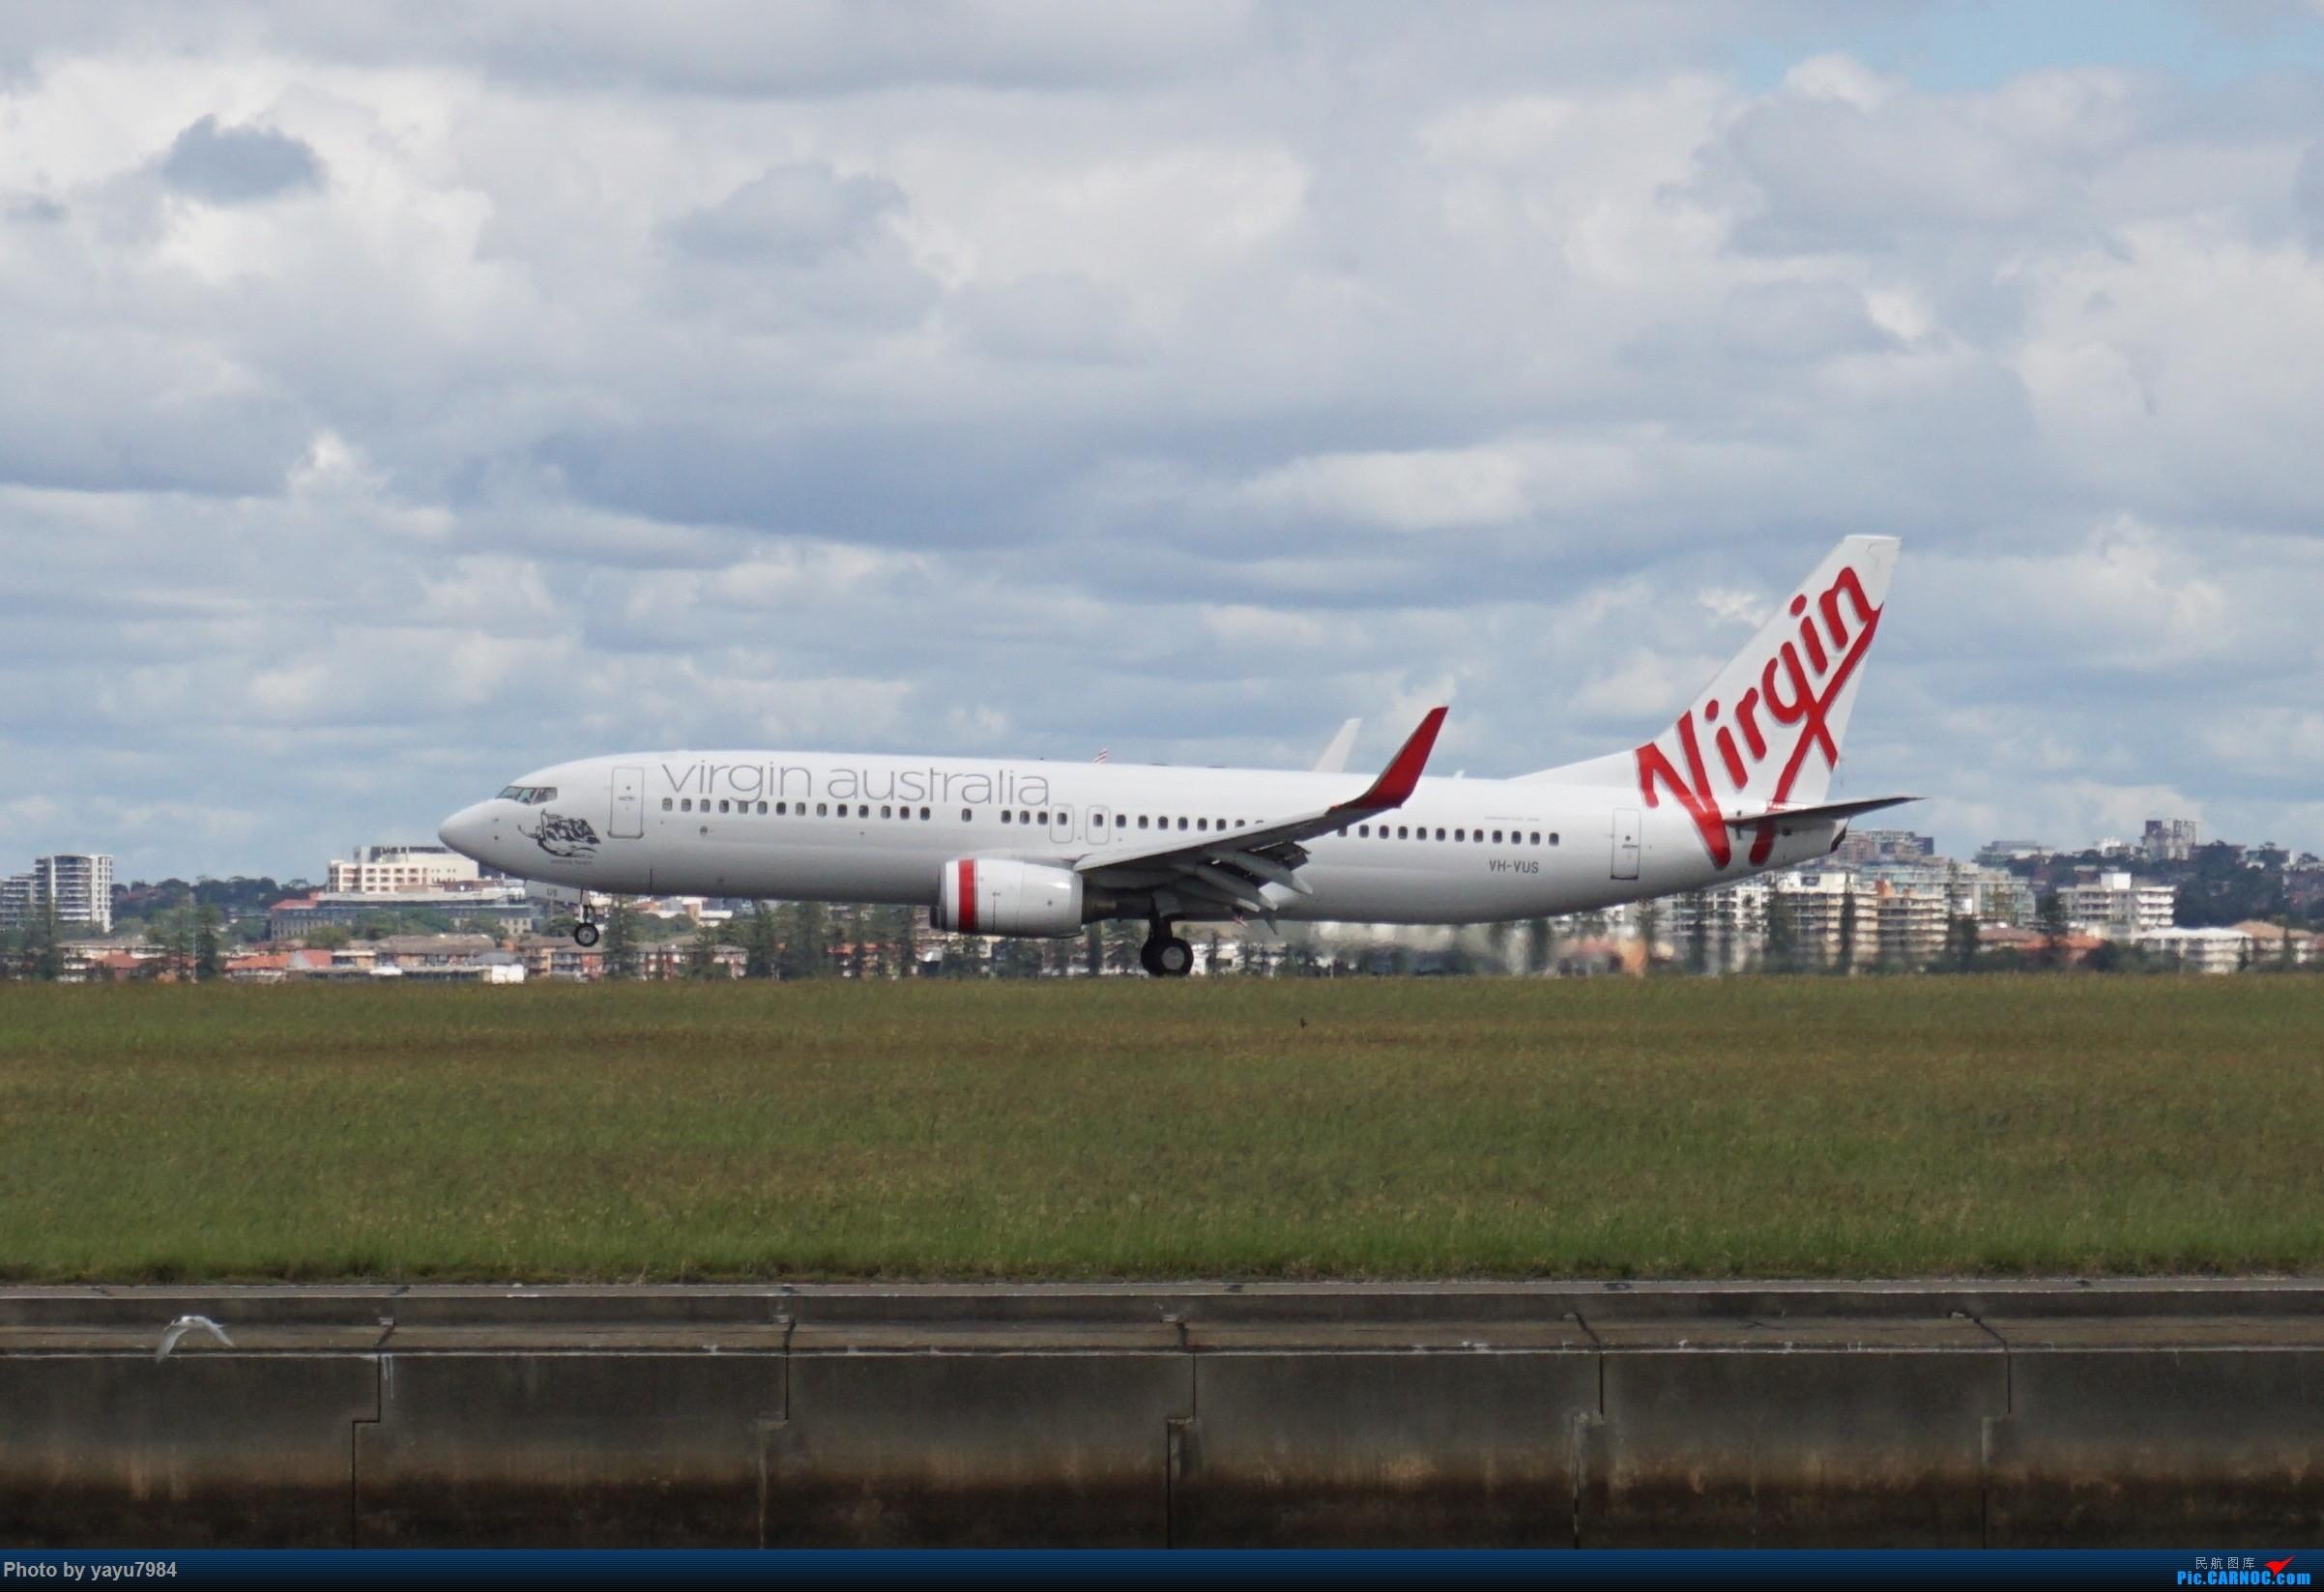 Re:[原创][SYD] 开帖分享一下16L/34R,以及07/25跑道周边的新拍机点位 BOEING 737-800 VH-VUS 澳大利亚悉尼金斯福德·史密斯机场